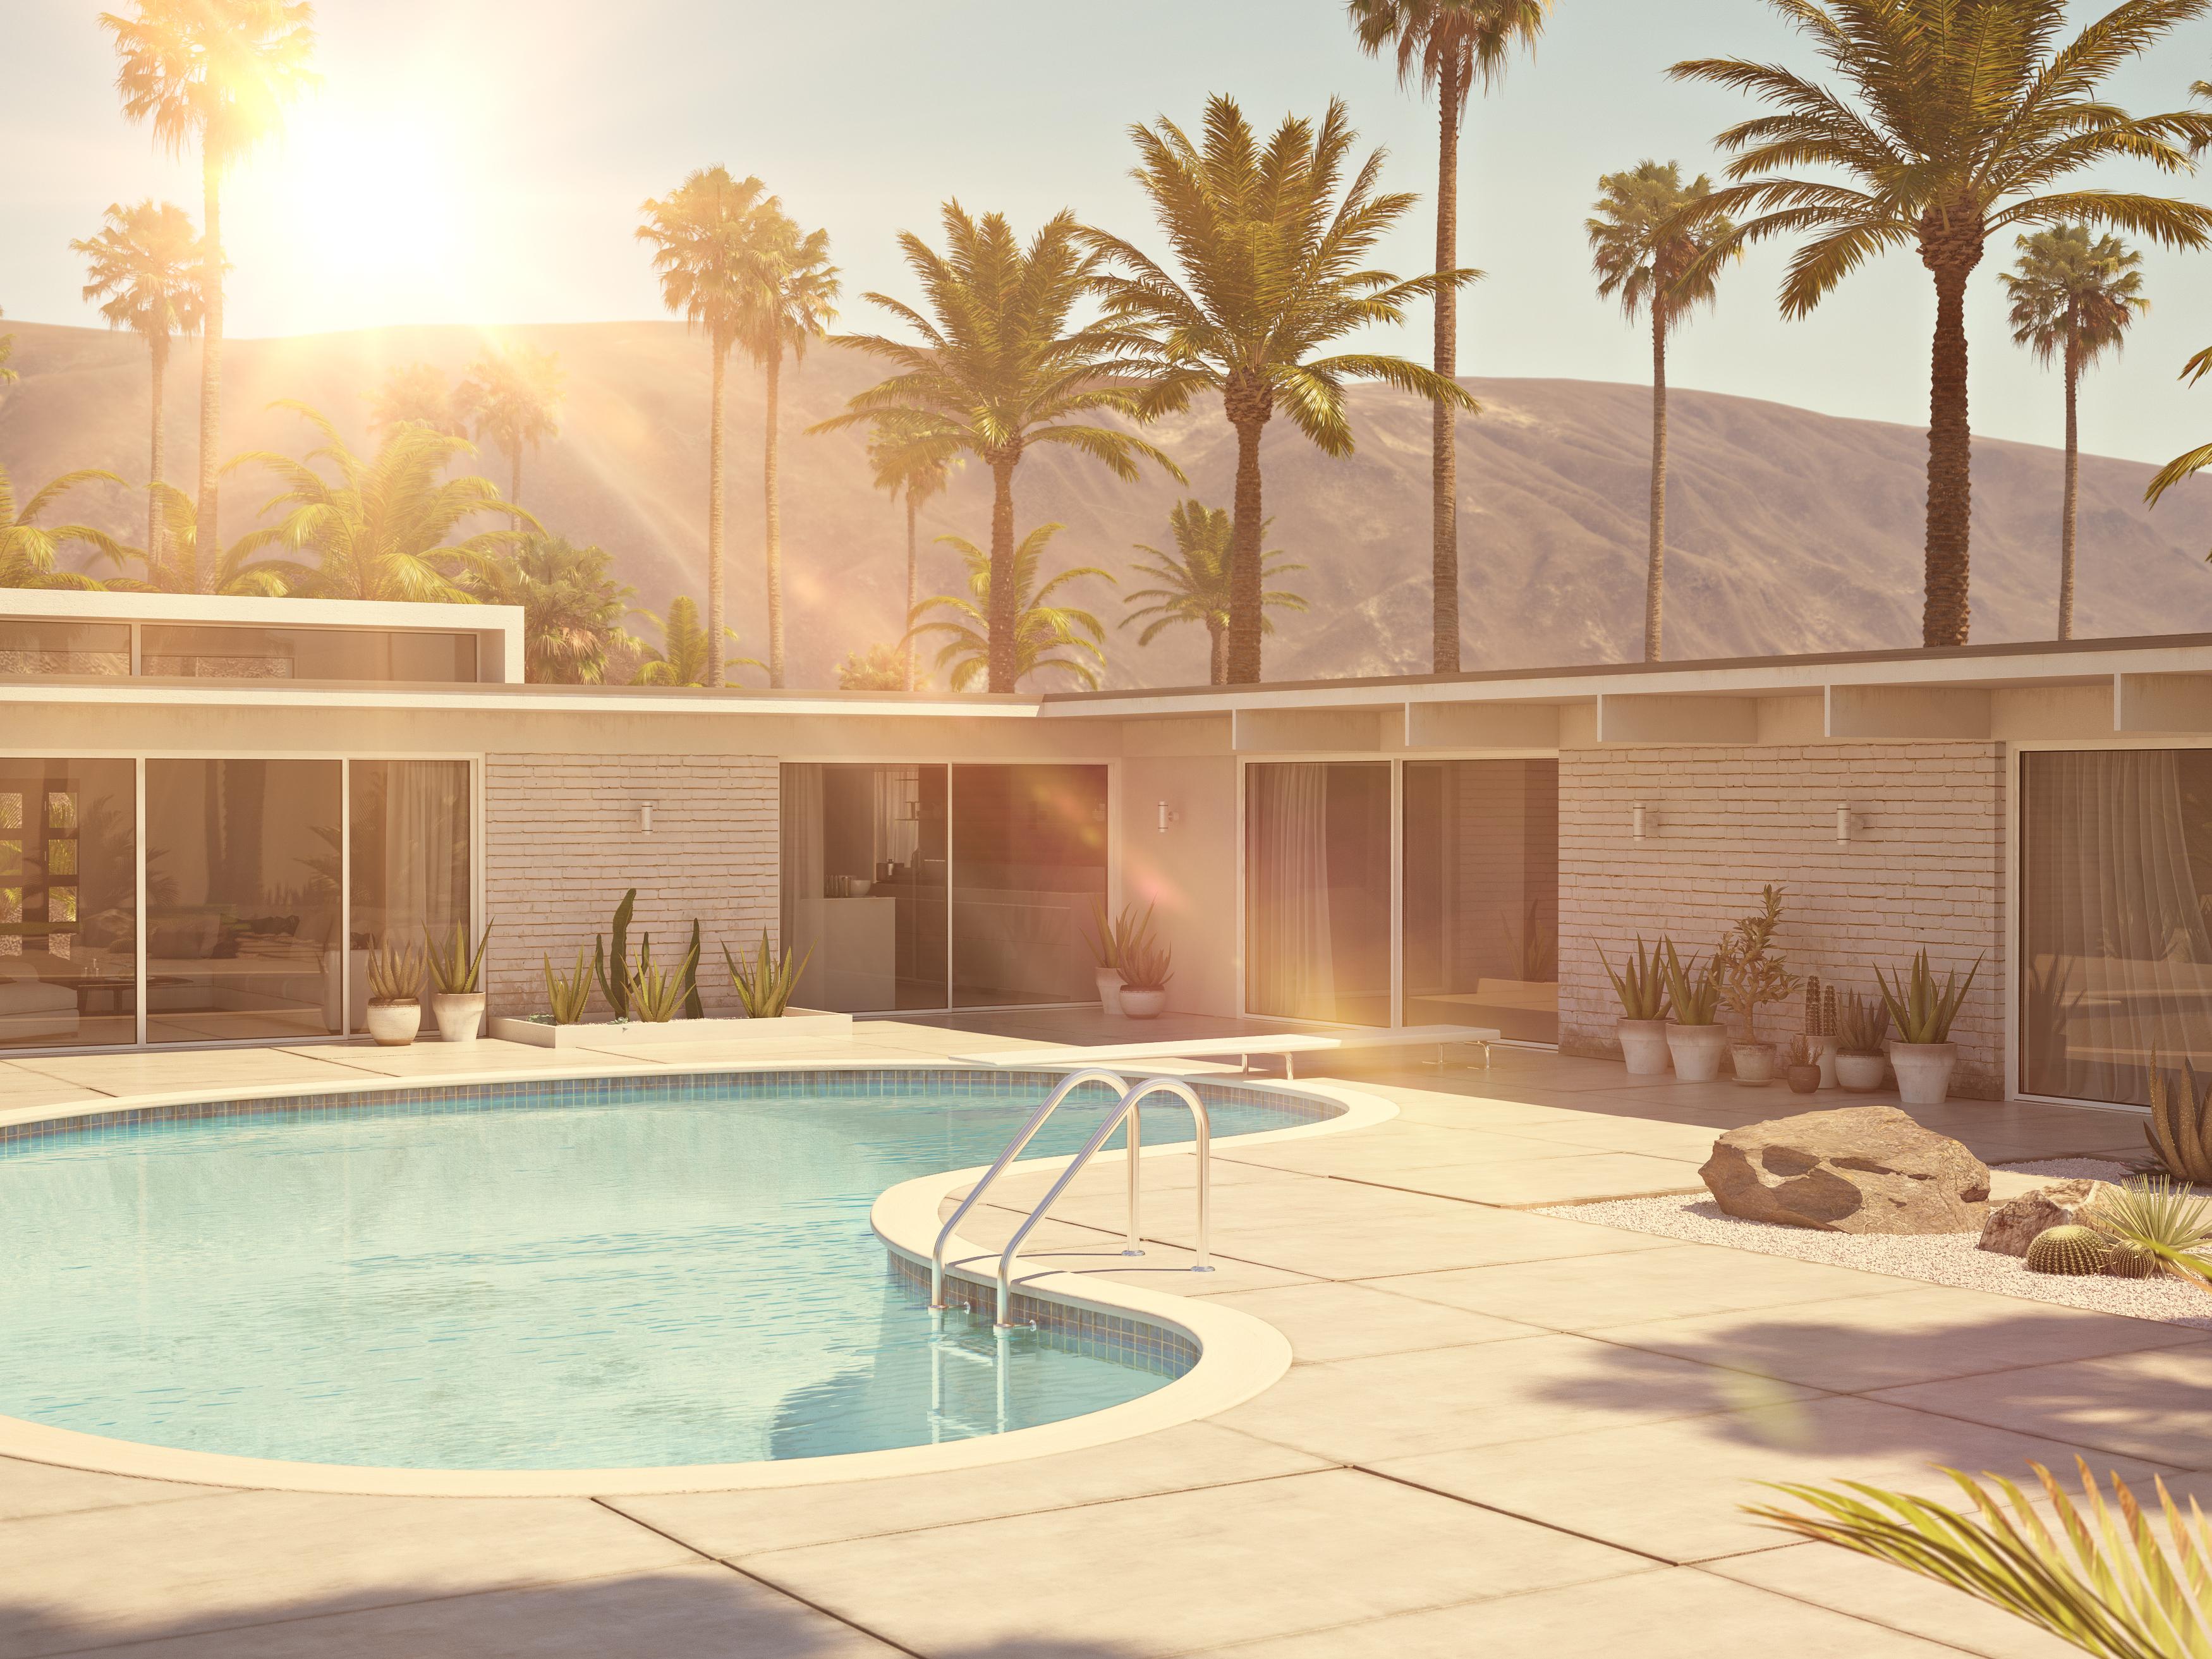 Palm Springs Los Angeles Curbed LA